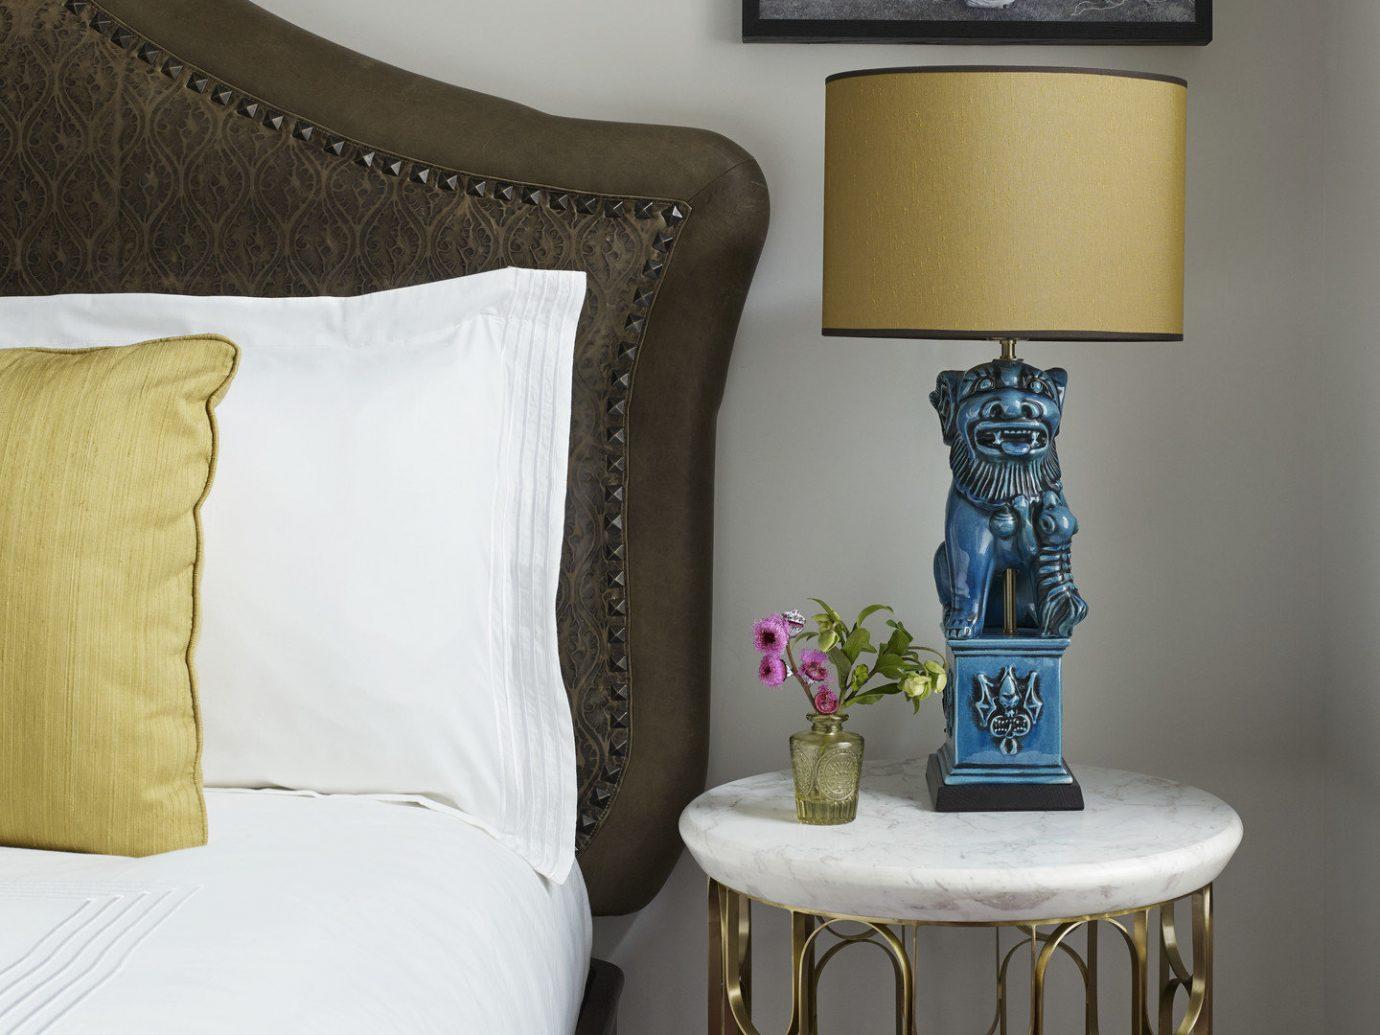 Hotels Luxury Travel Romantic Hotels wall indoor room bed pillow furniture interior design living room bed sheet Design textile Bedroom Suite